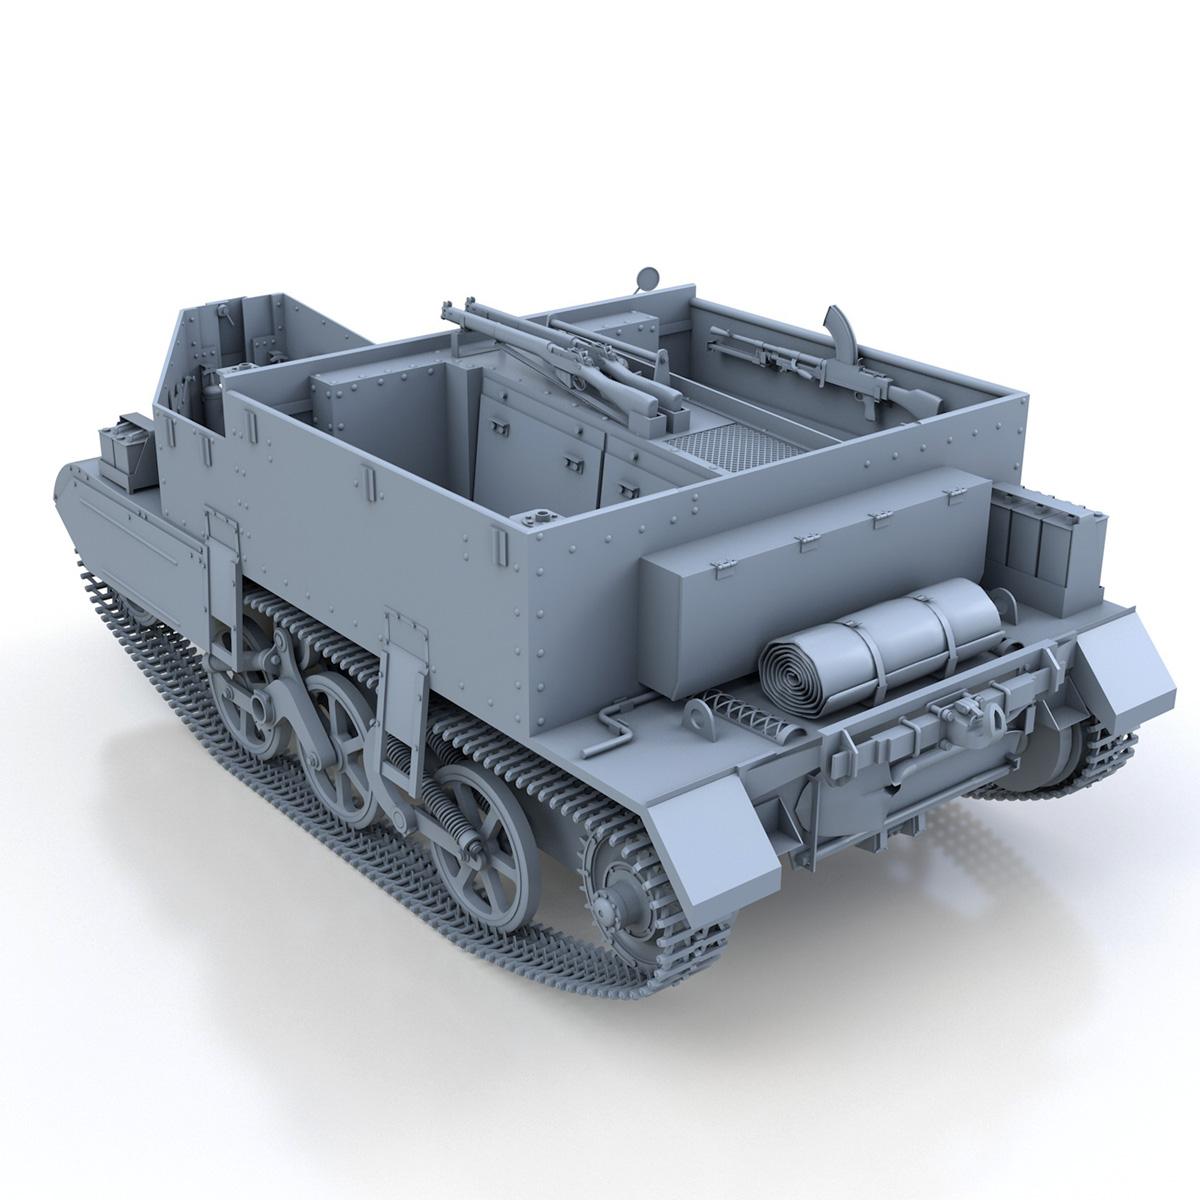 Universal Carrier MK II - Bren Gun Carrier 3d model 3ds fbx c4d lwo lws lw obj 272960